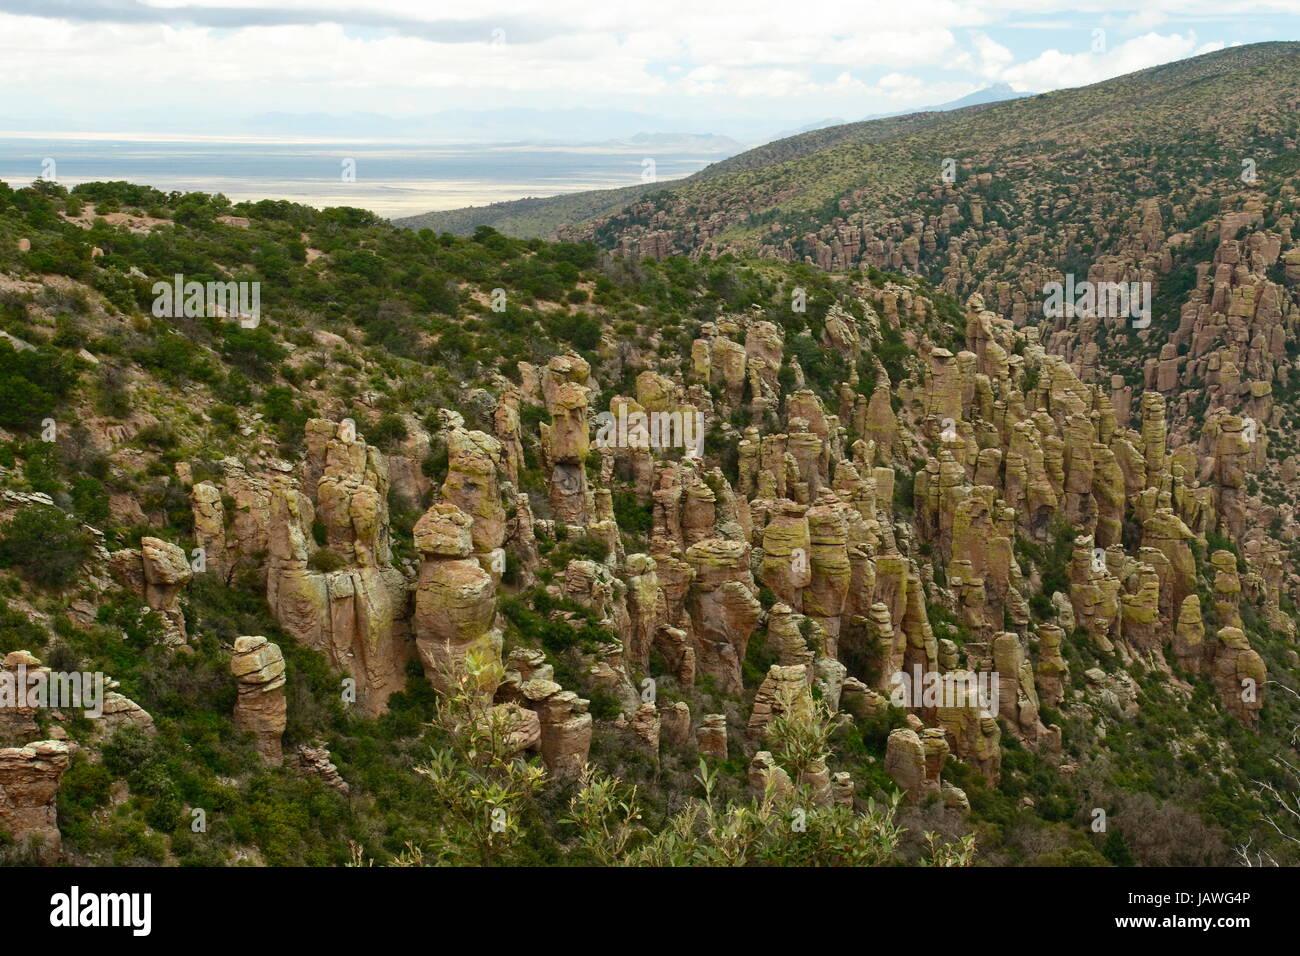 The Chiricahua National mountains in southeastern Arizona. - Stock Image